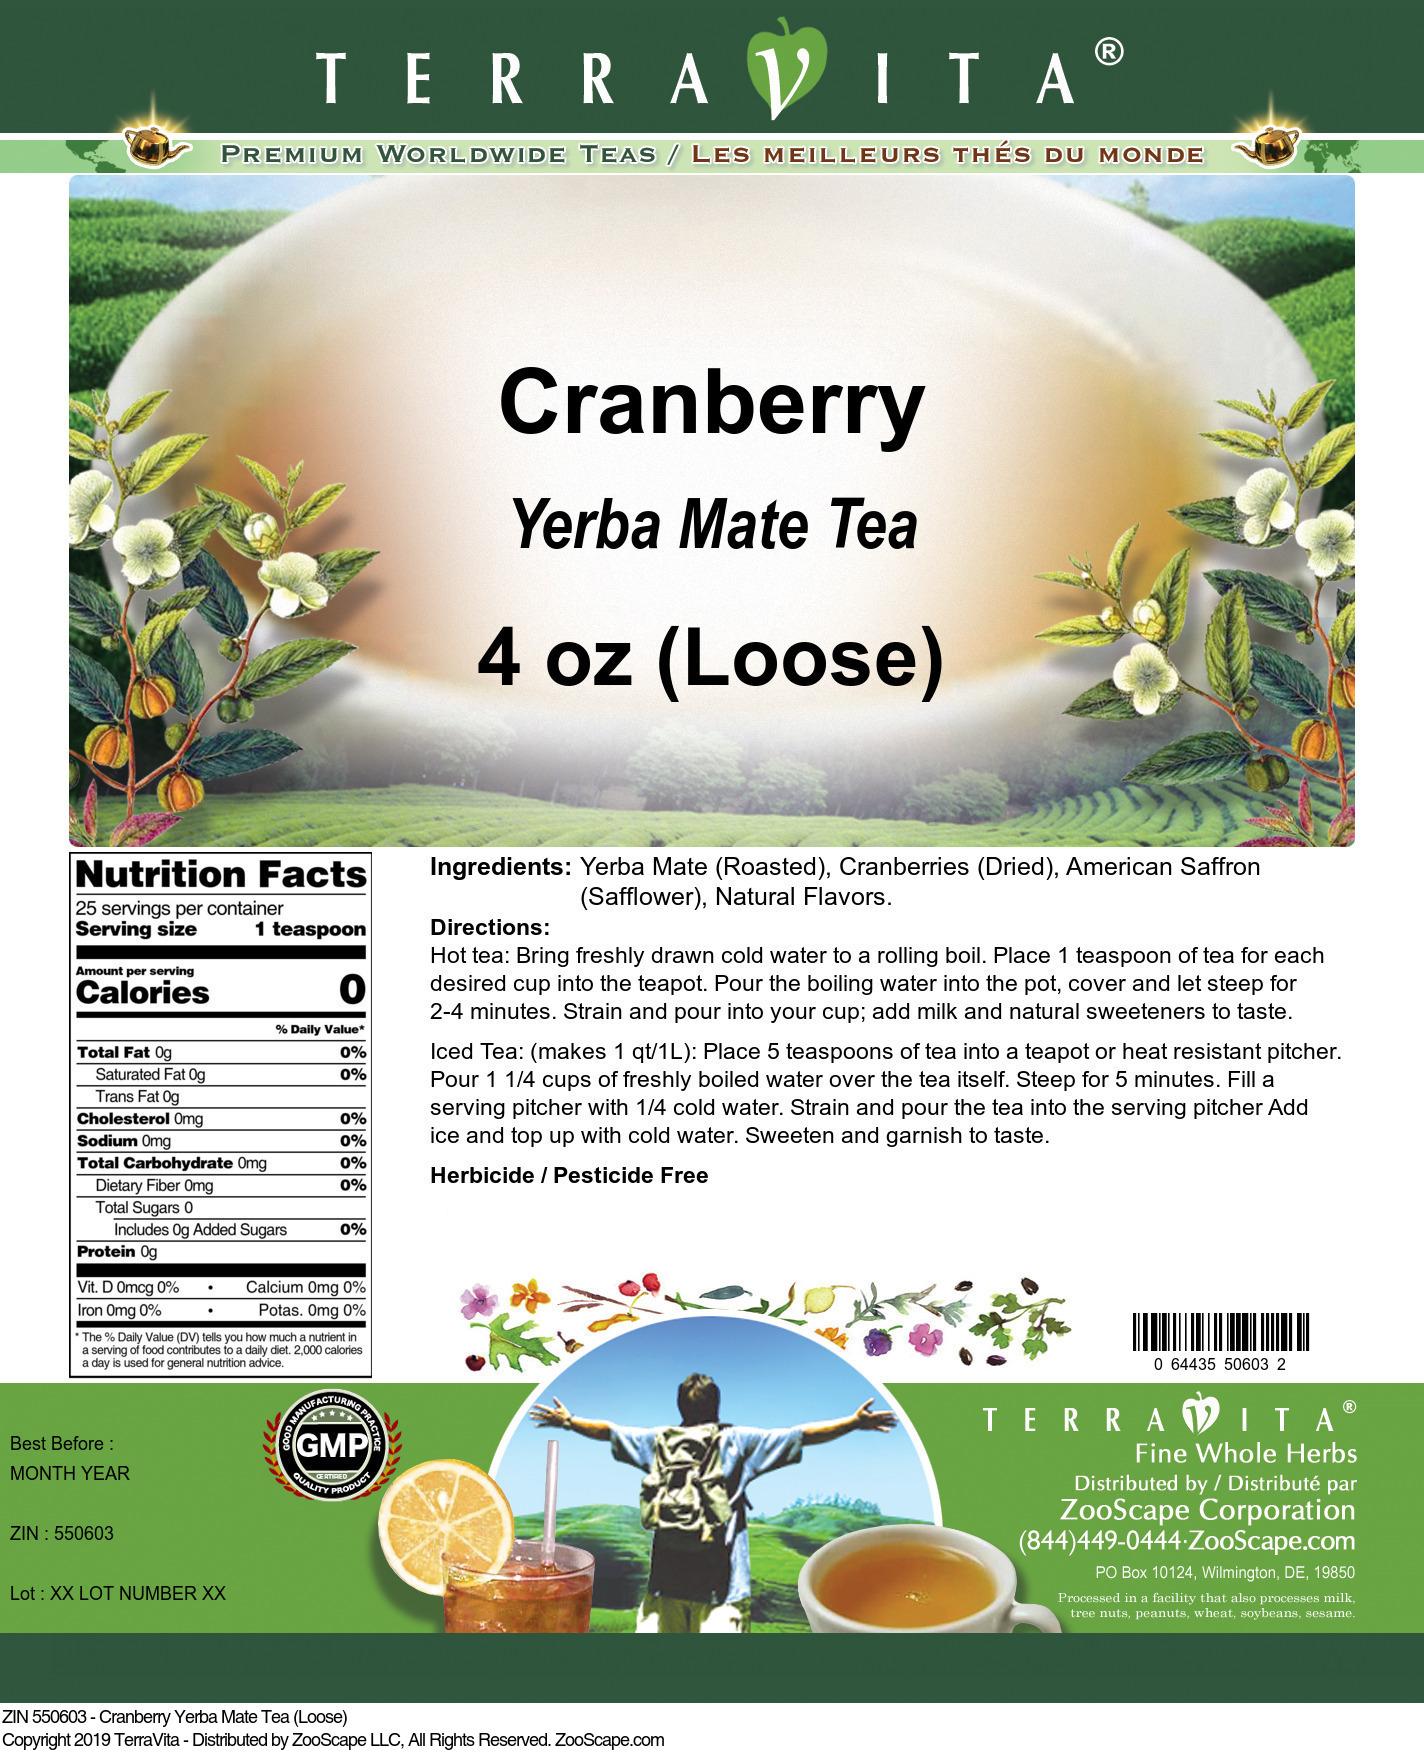 Cranberry Yerba Mate